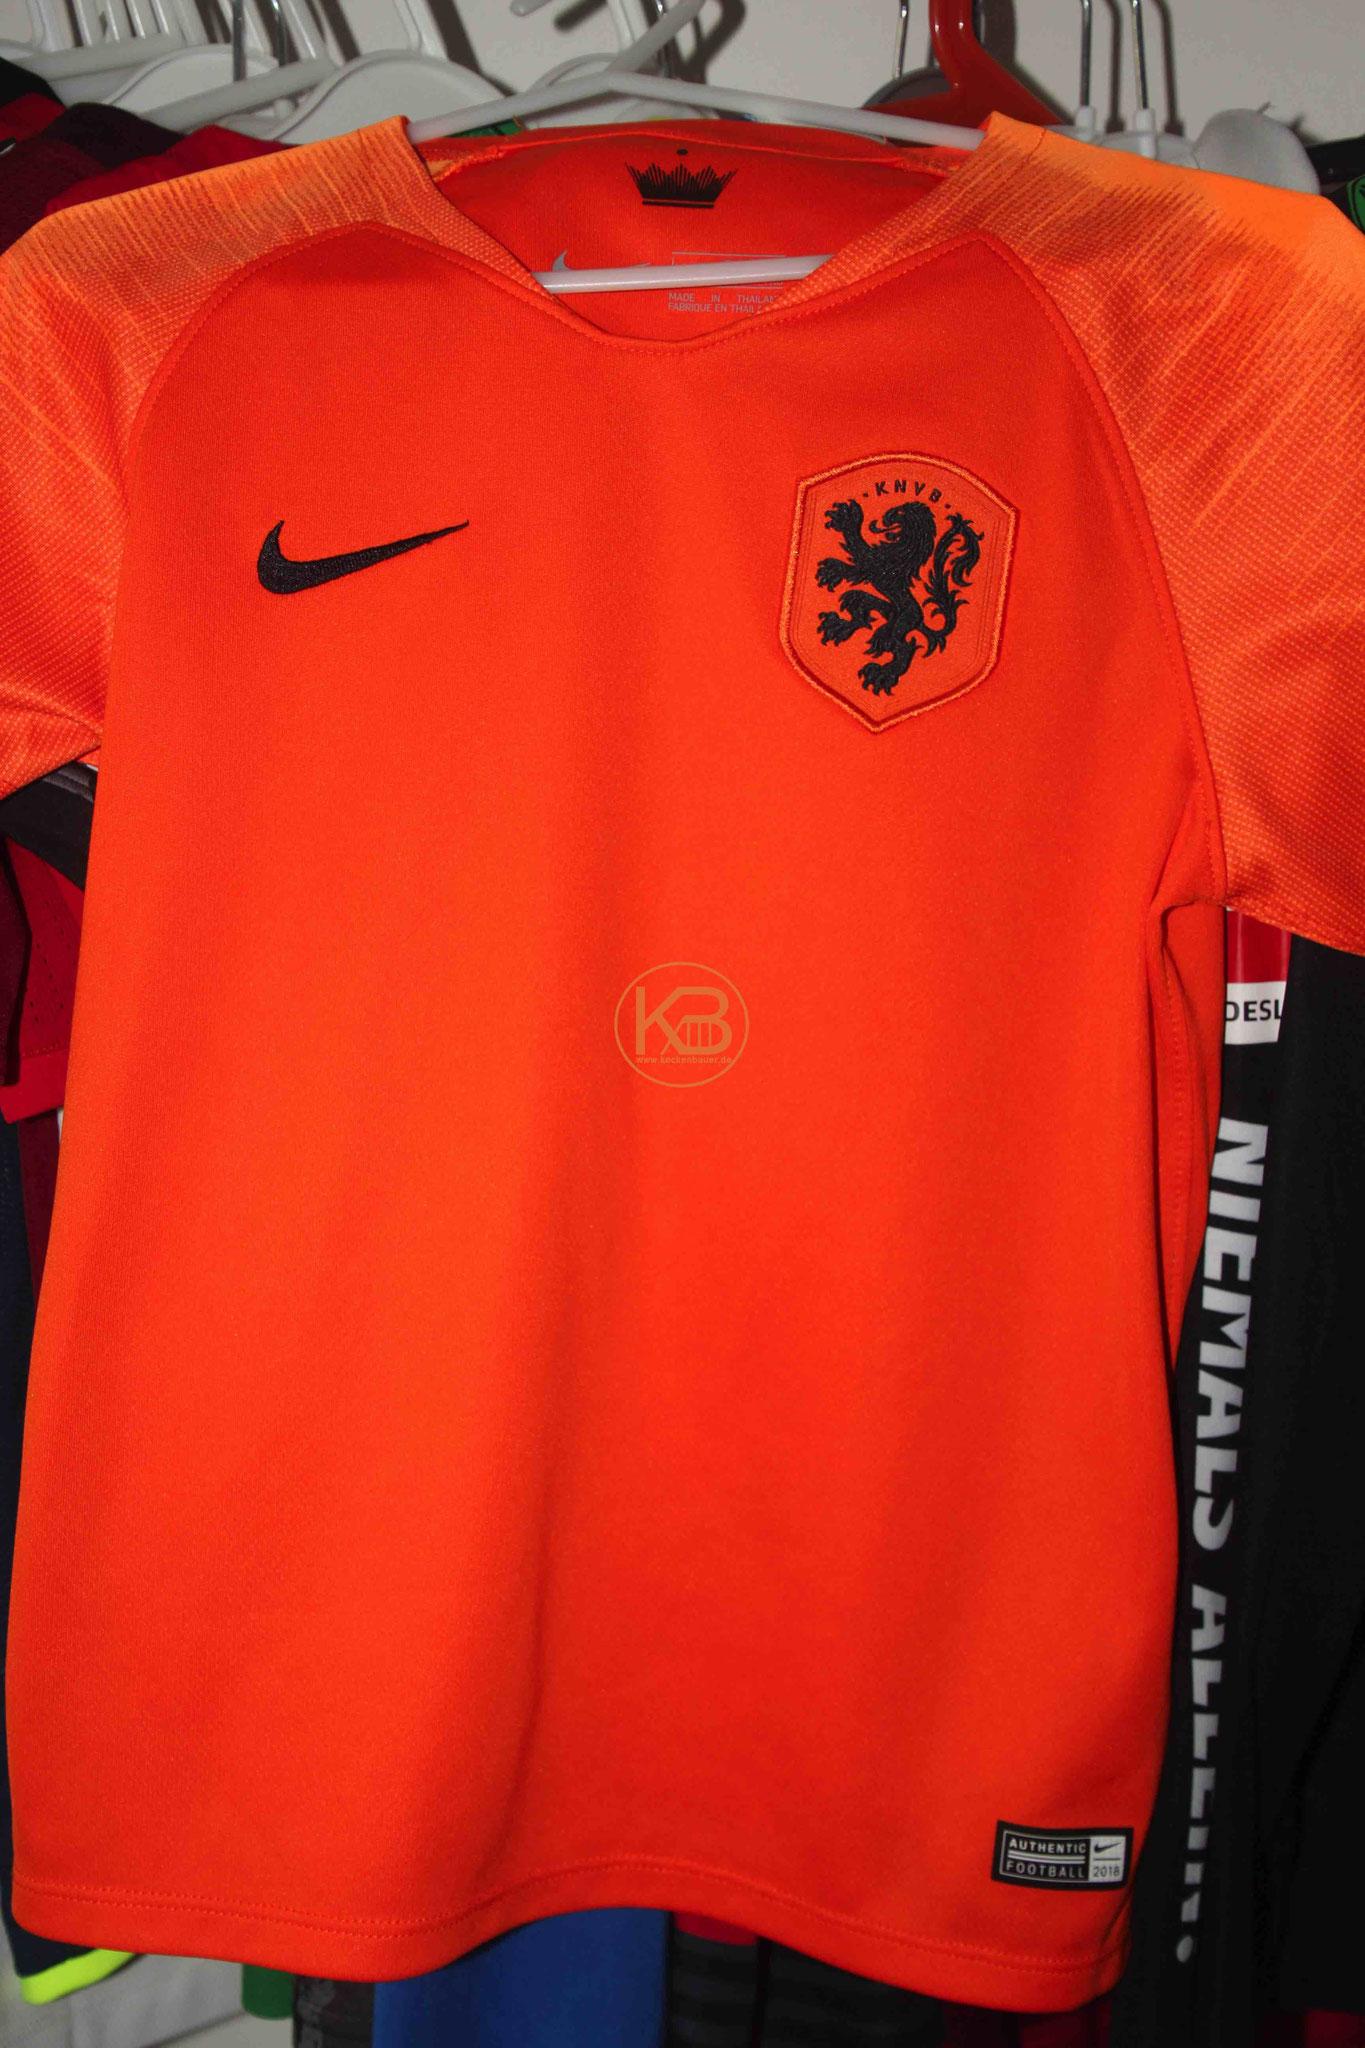 Nike Nationalmannschaftstrikot der Niederlande